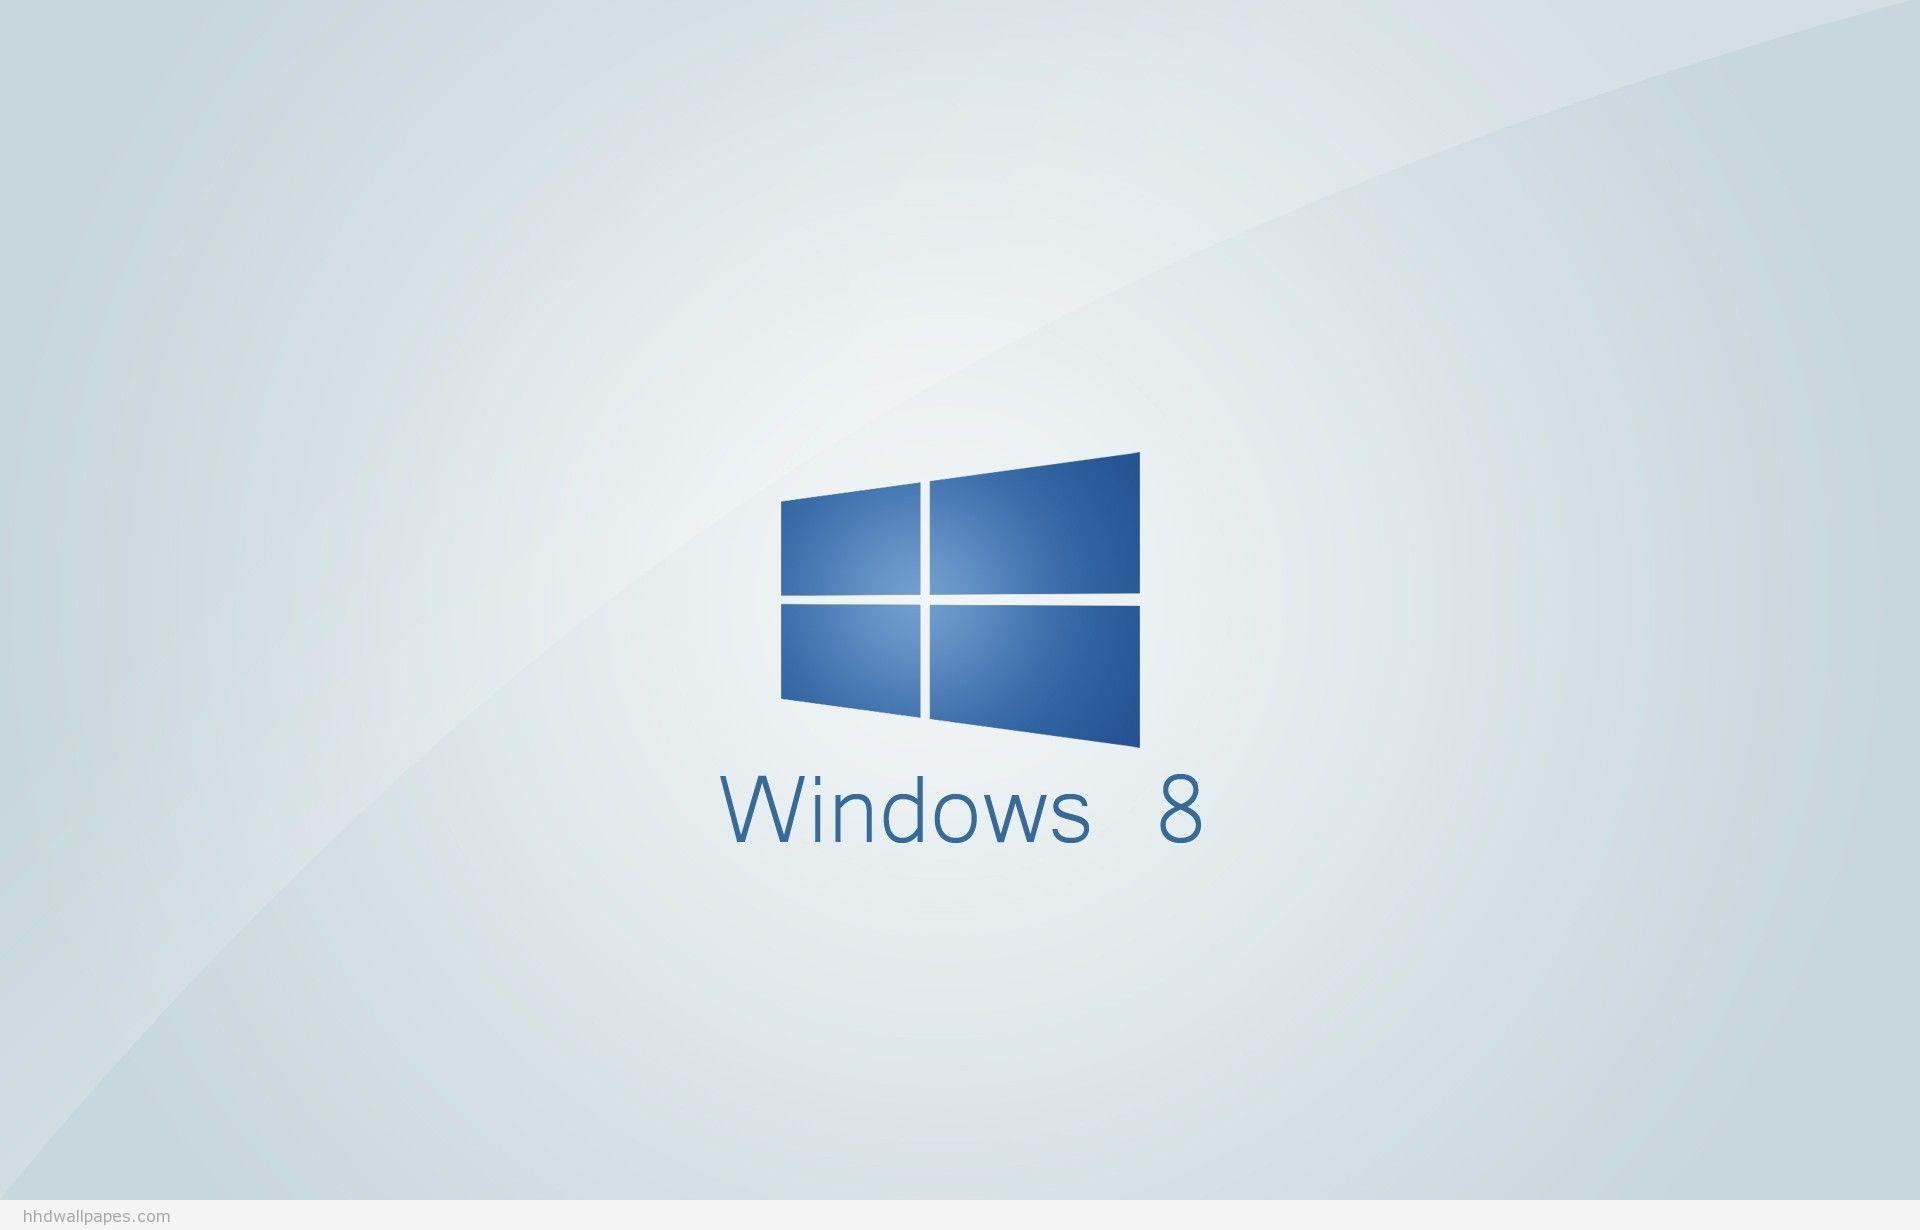 Windows 8 Full Hd Wallpapers Hd Wallpaper Windows Desktop Wallpaper Full Hd Wallpaper